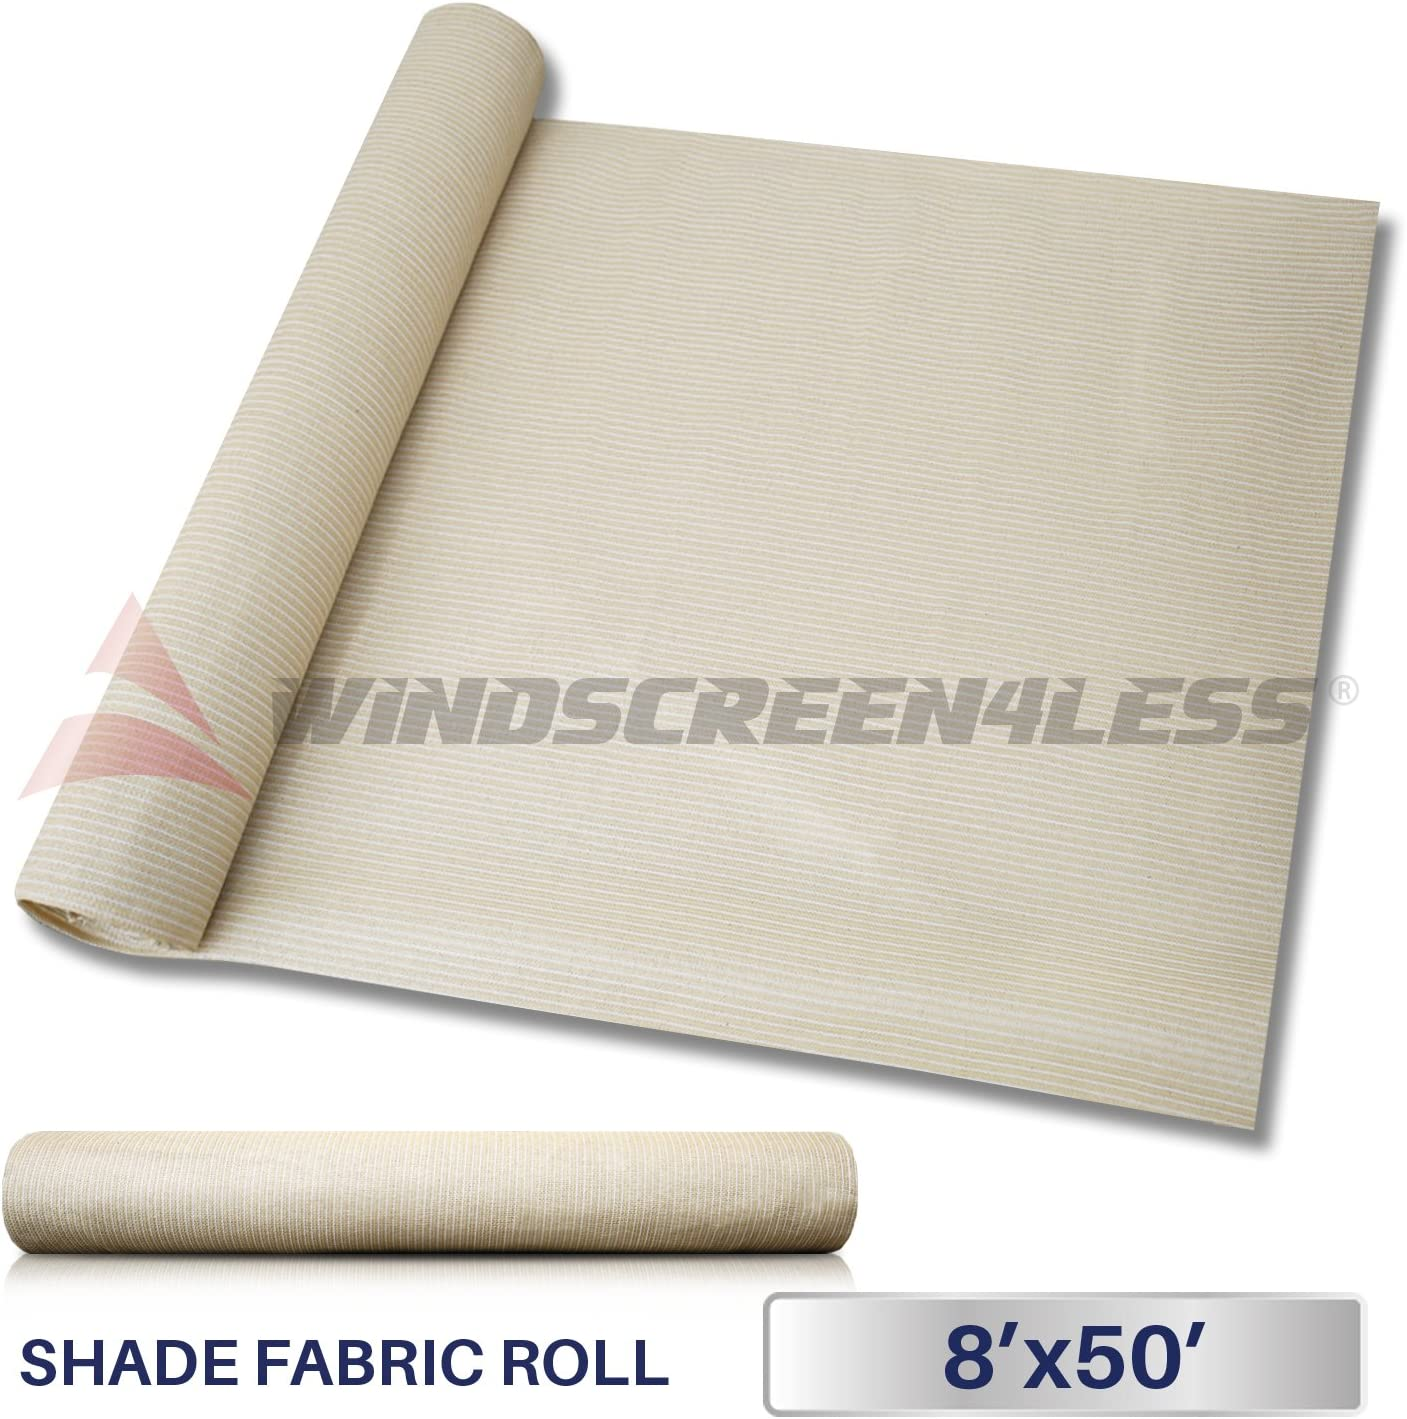 Windscreen4less Beige Sunblock Shade Cloth,95 UV Block Shade Fabric Roll 8ft x 50ft